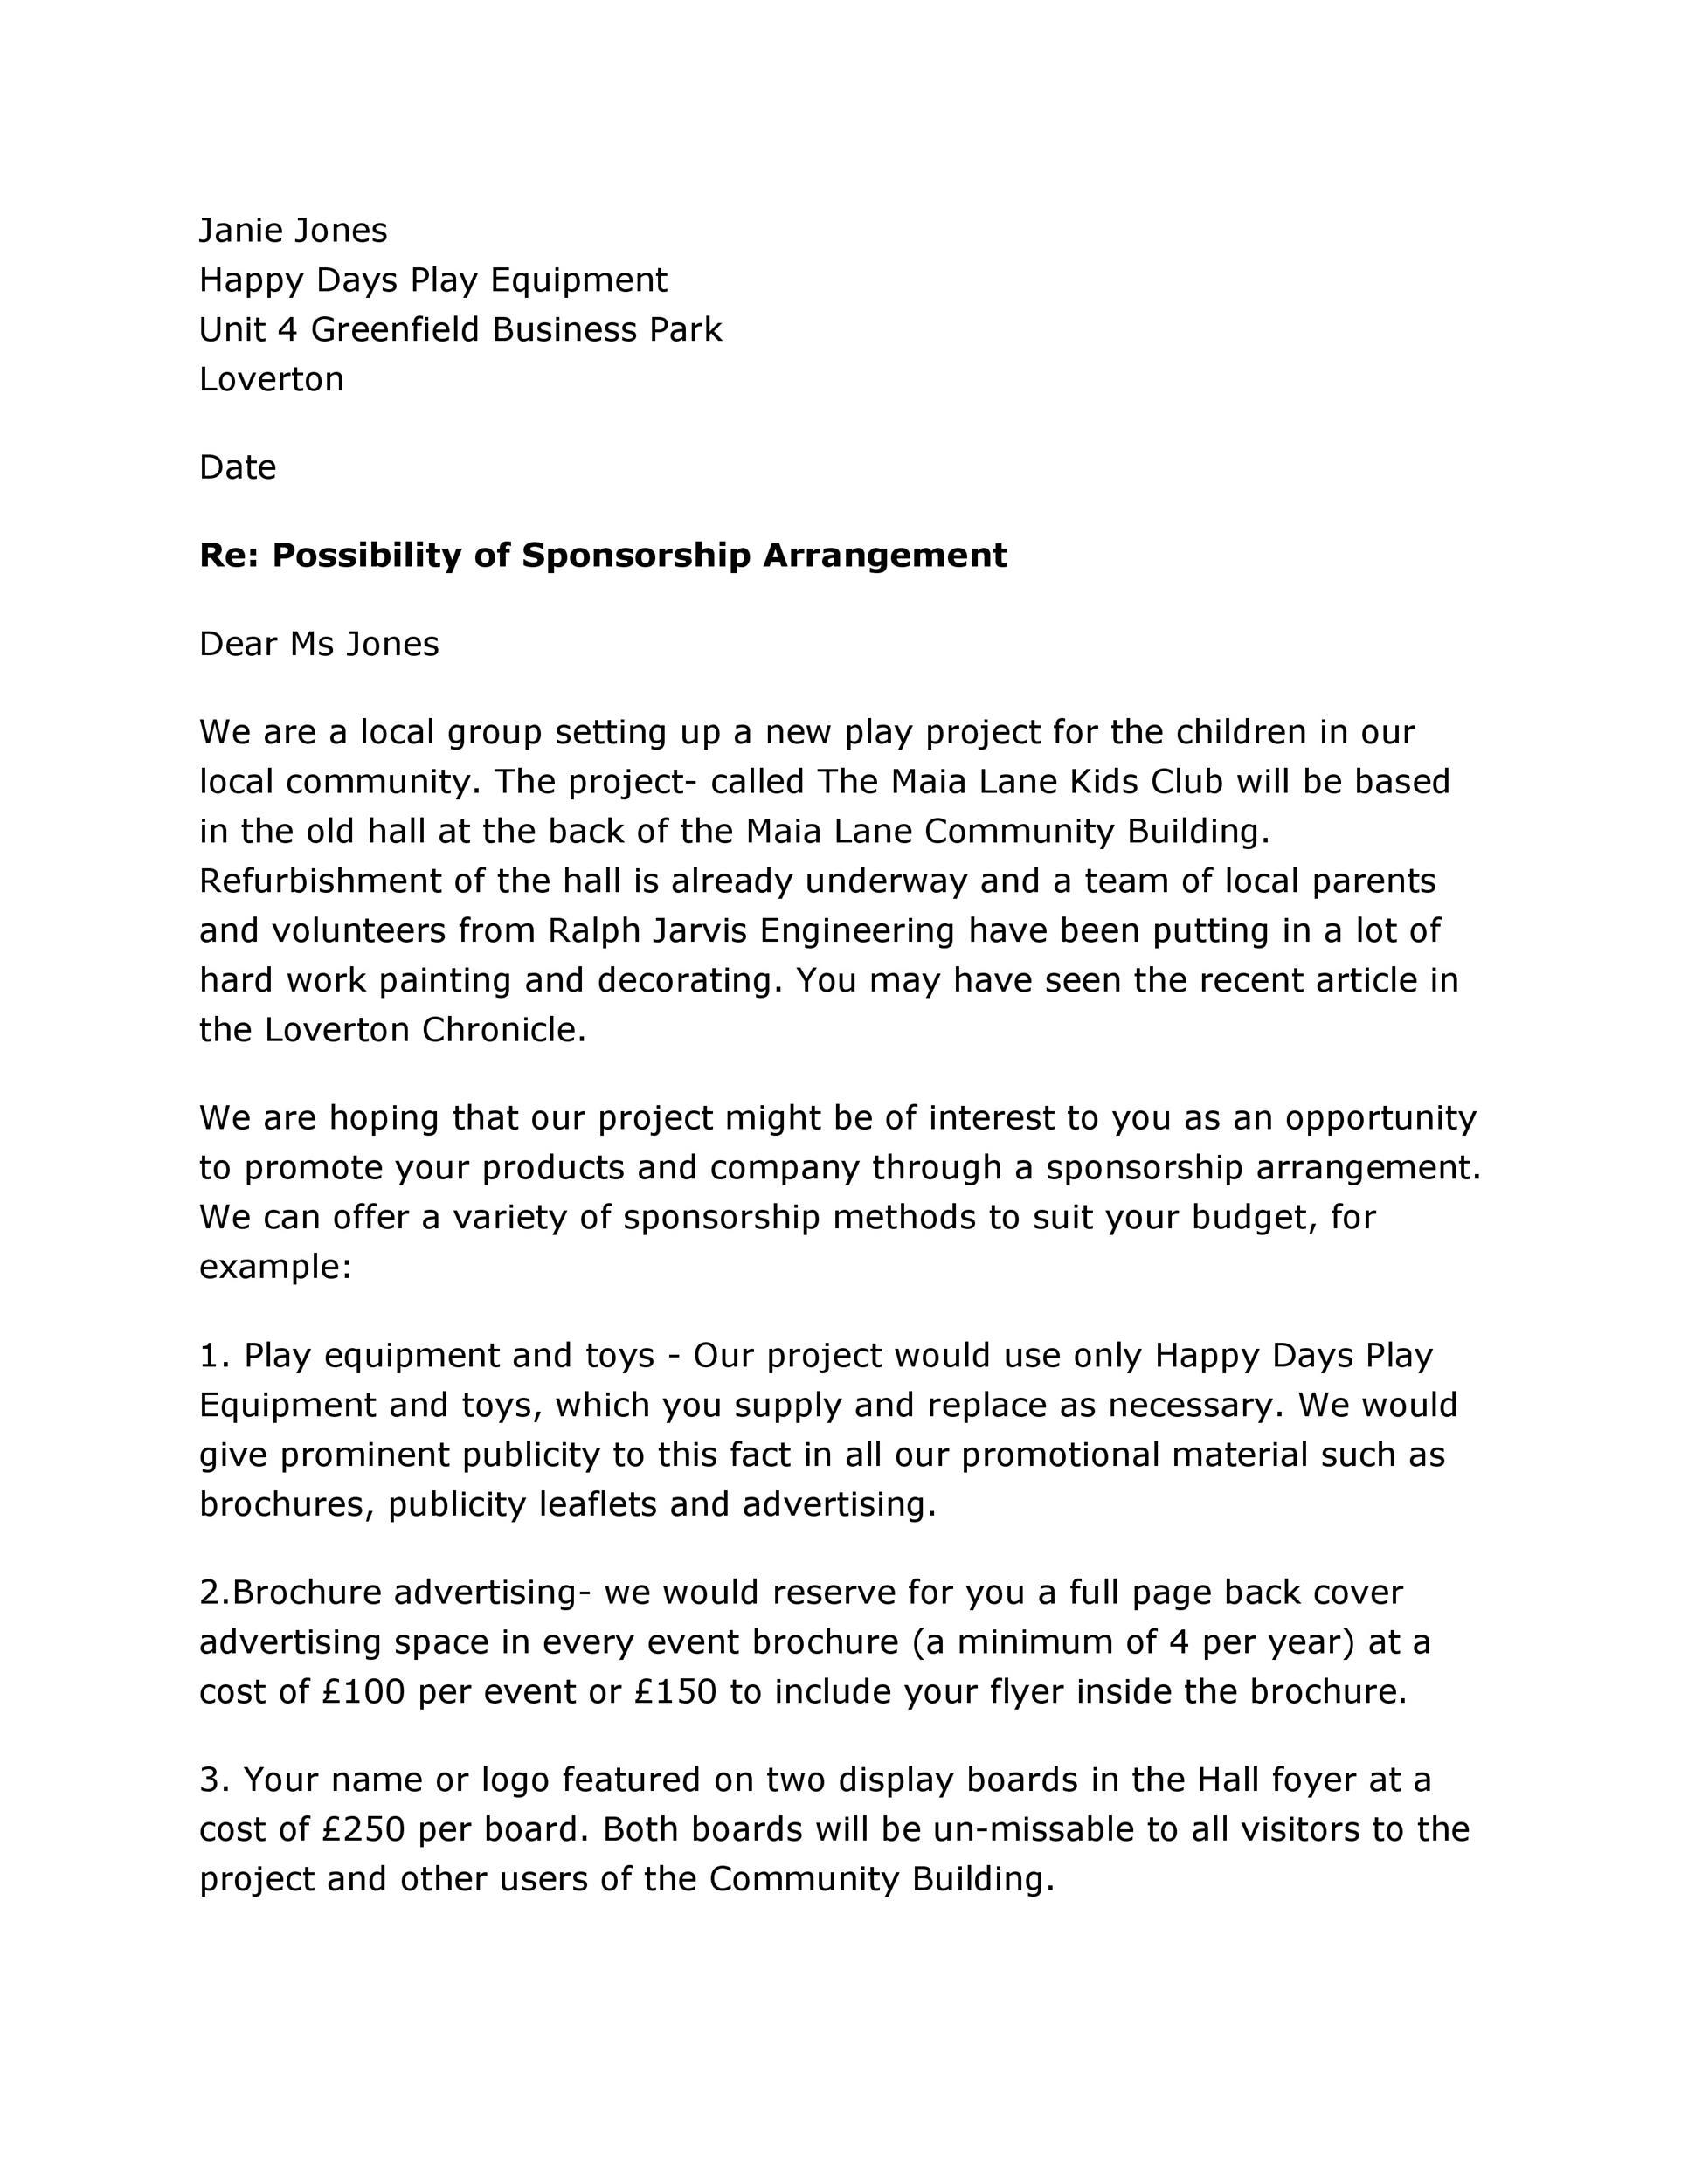 Free Sponsorship Letter Template 14